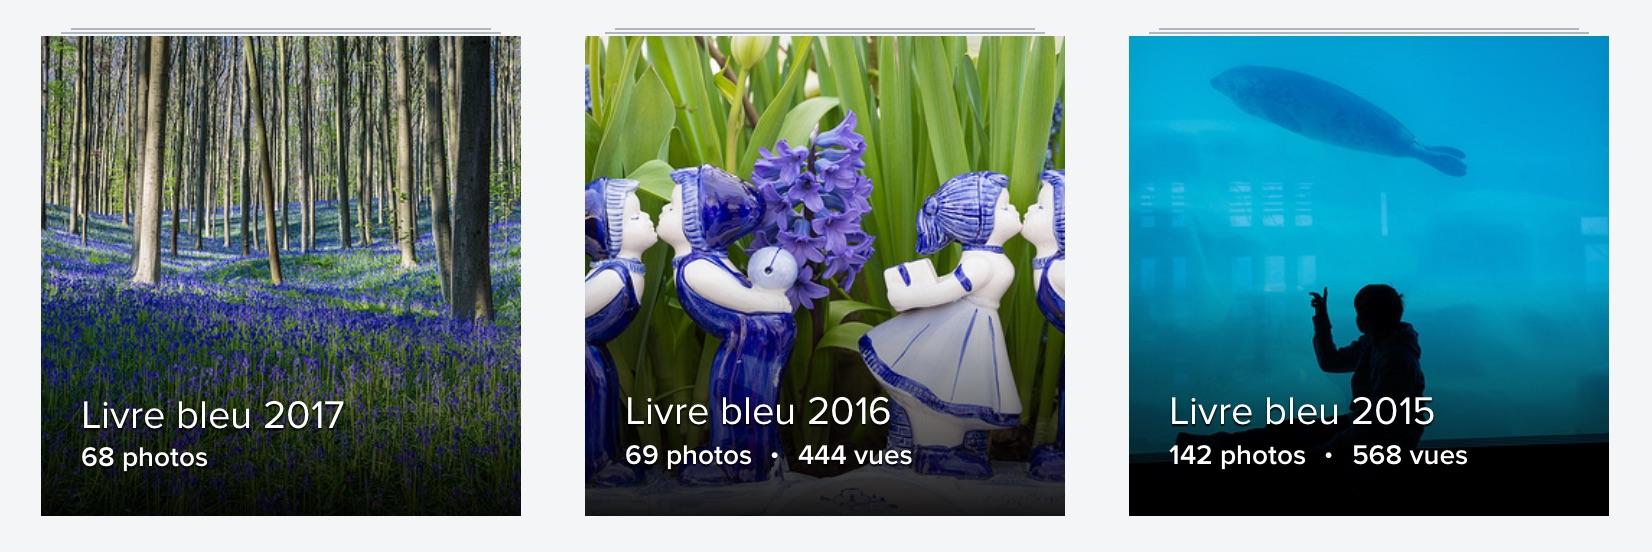 image-livre-bleu